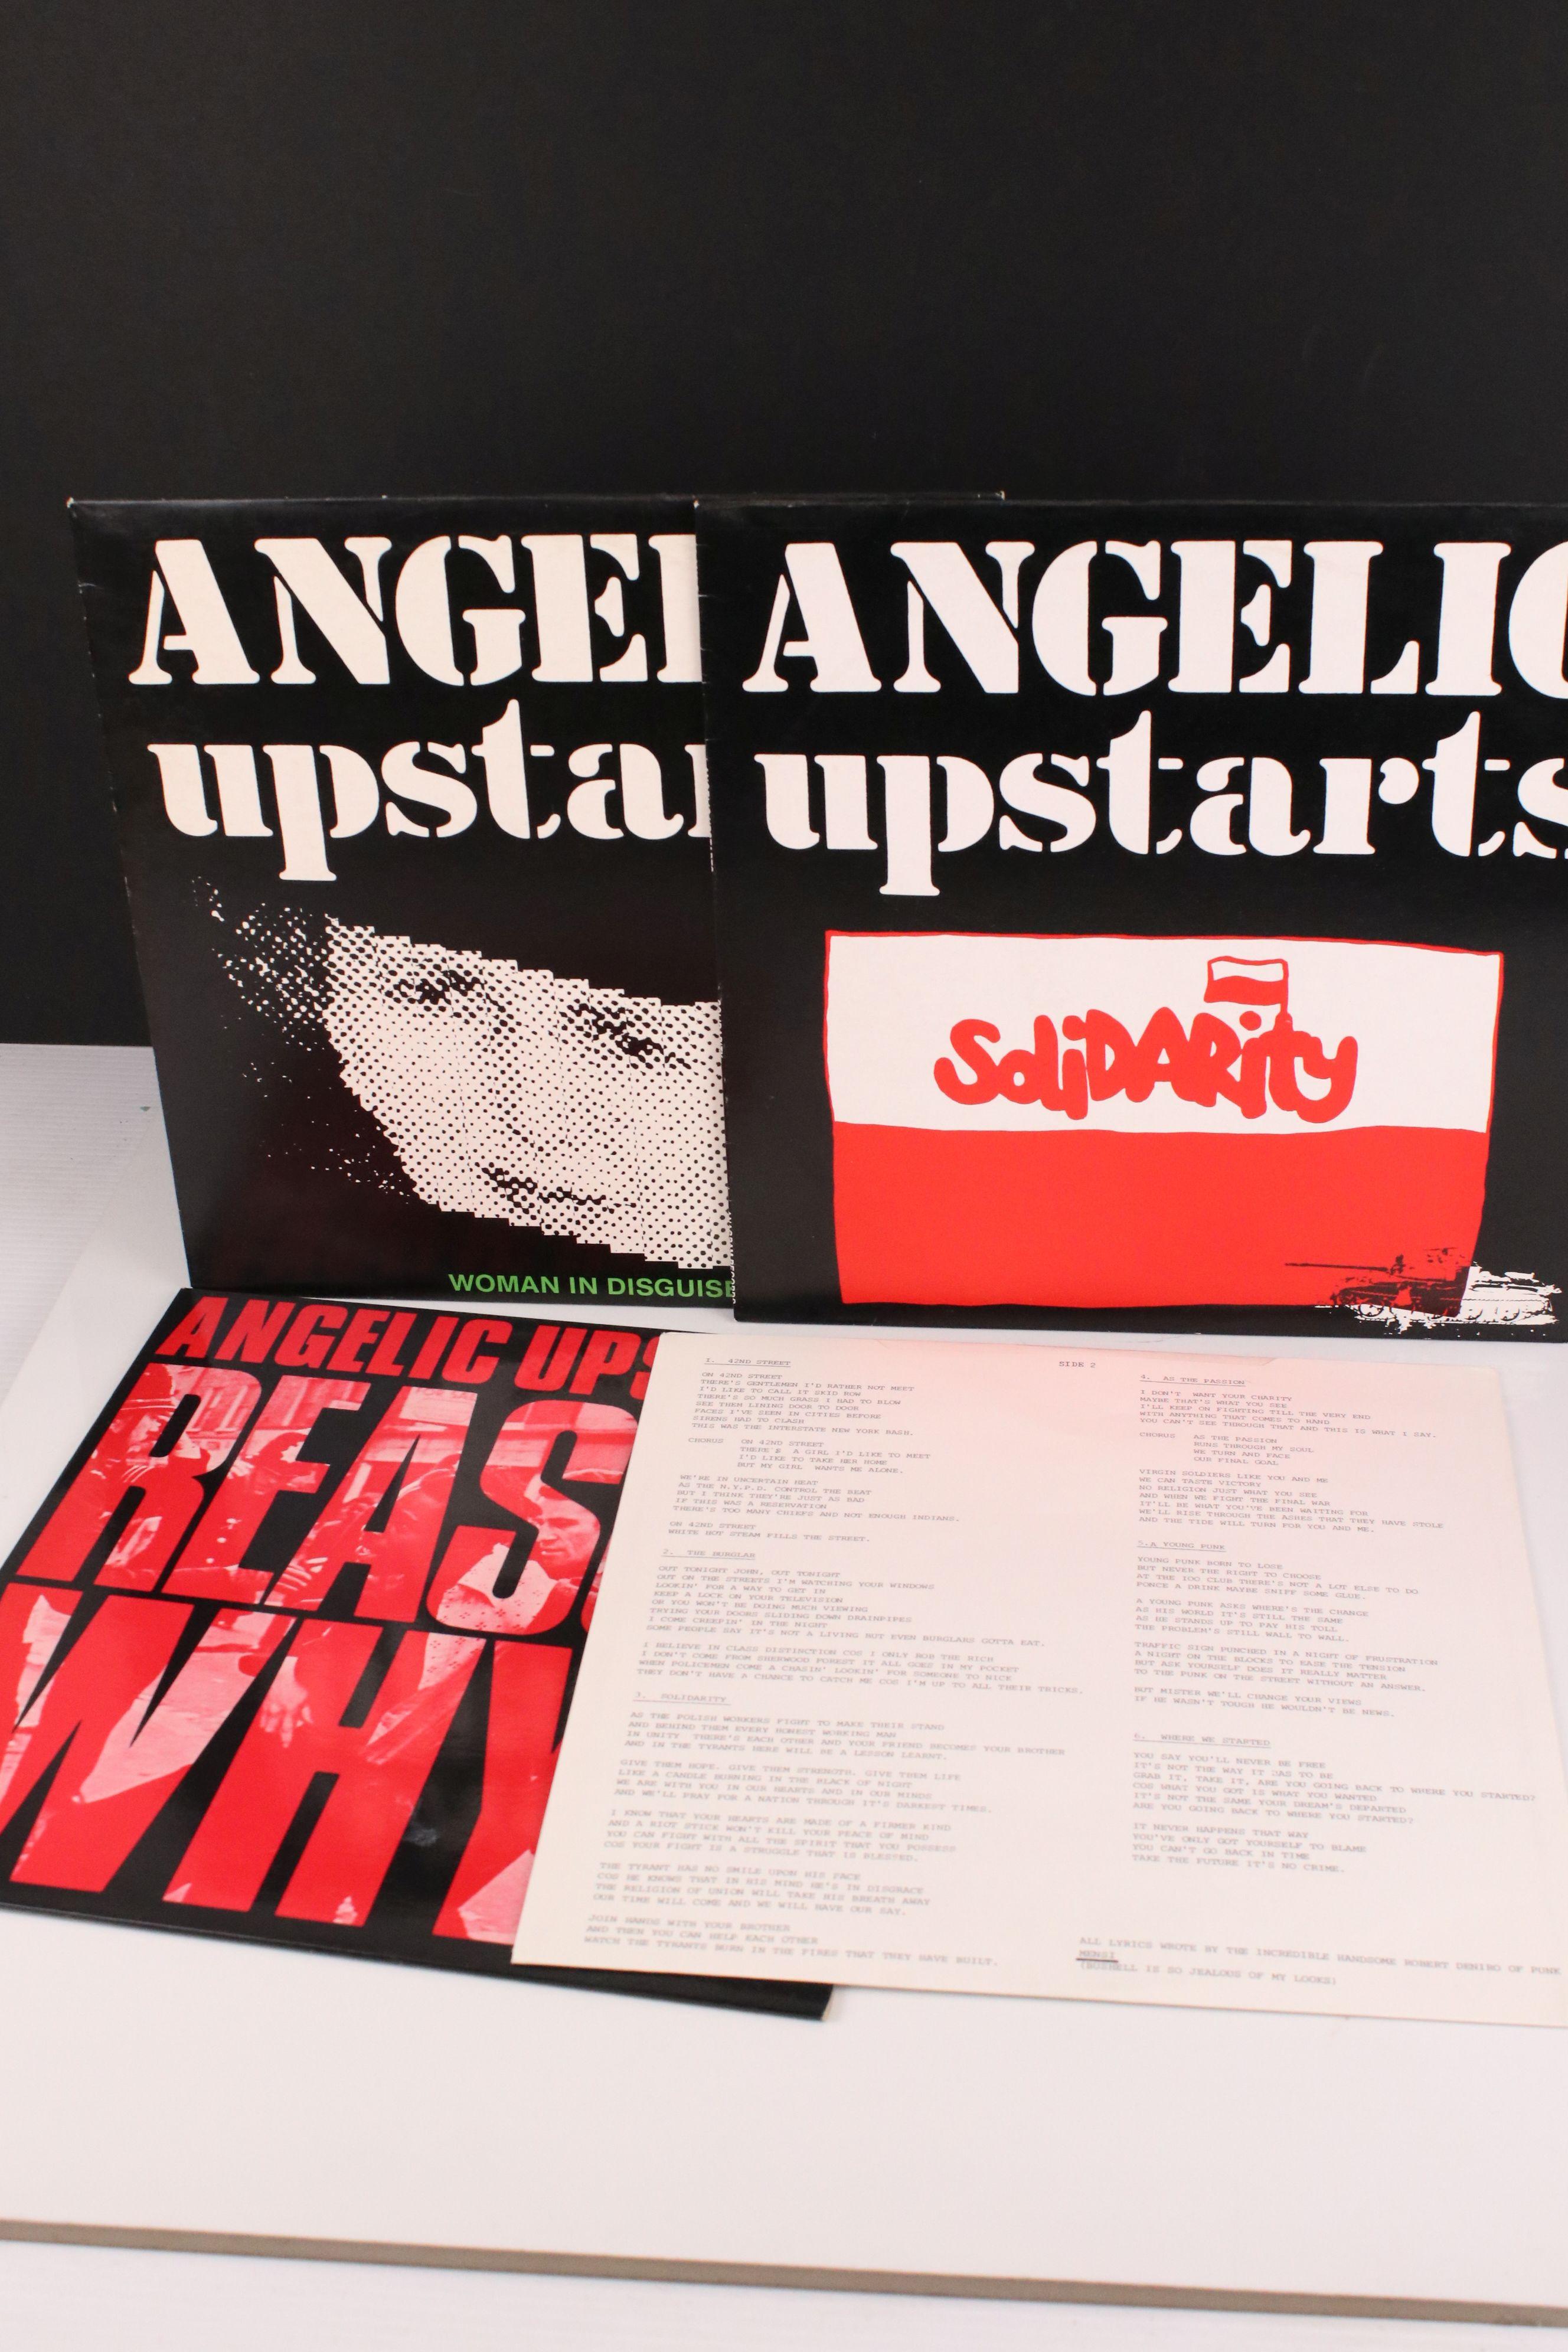 "Vinyl - Punk - Angelic Upstarts - Reason Why? LP plus 2 x 12"" singles (Solidarity & Woman In"